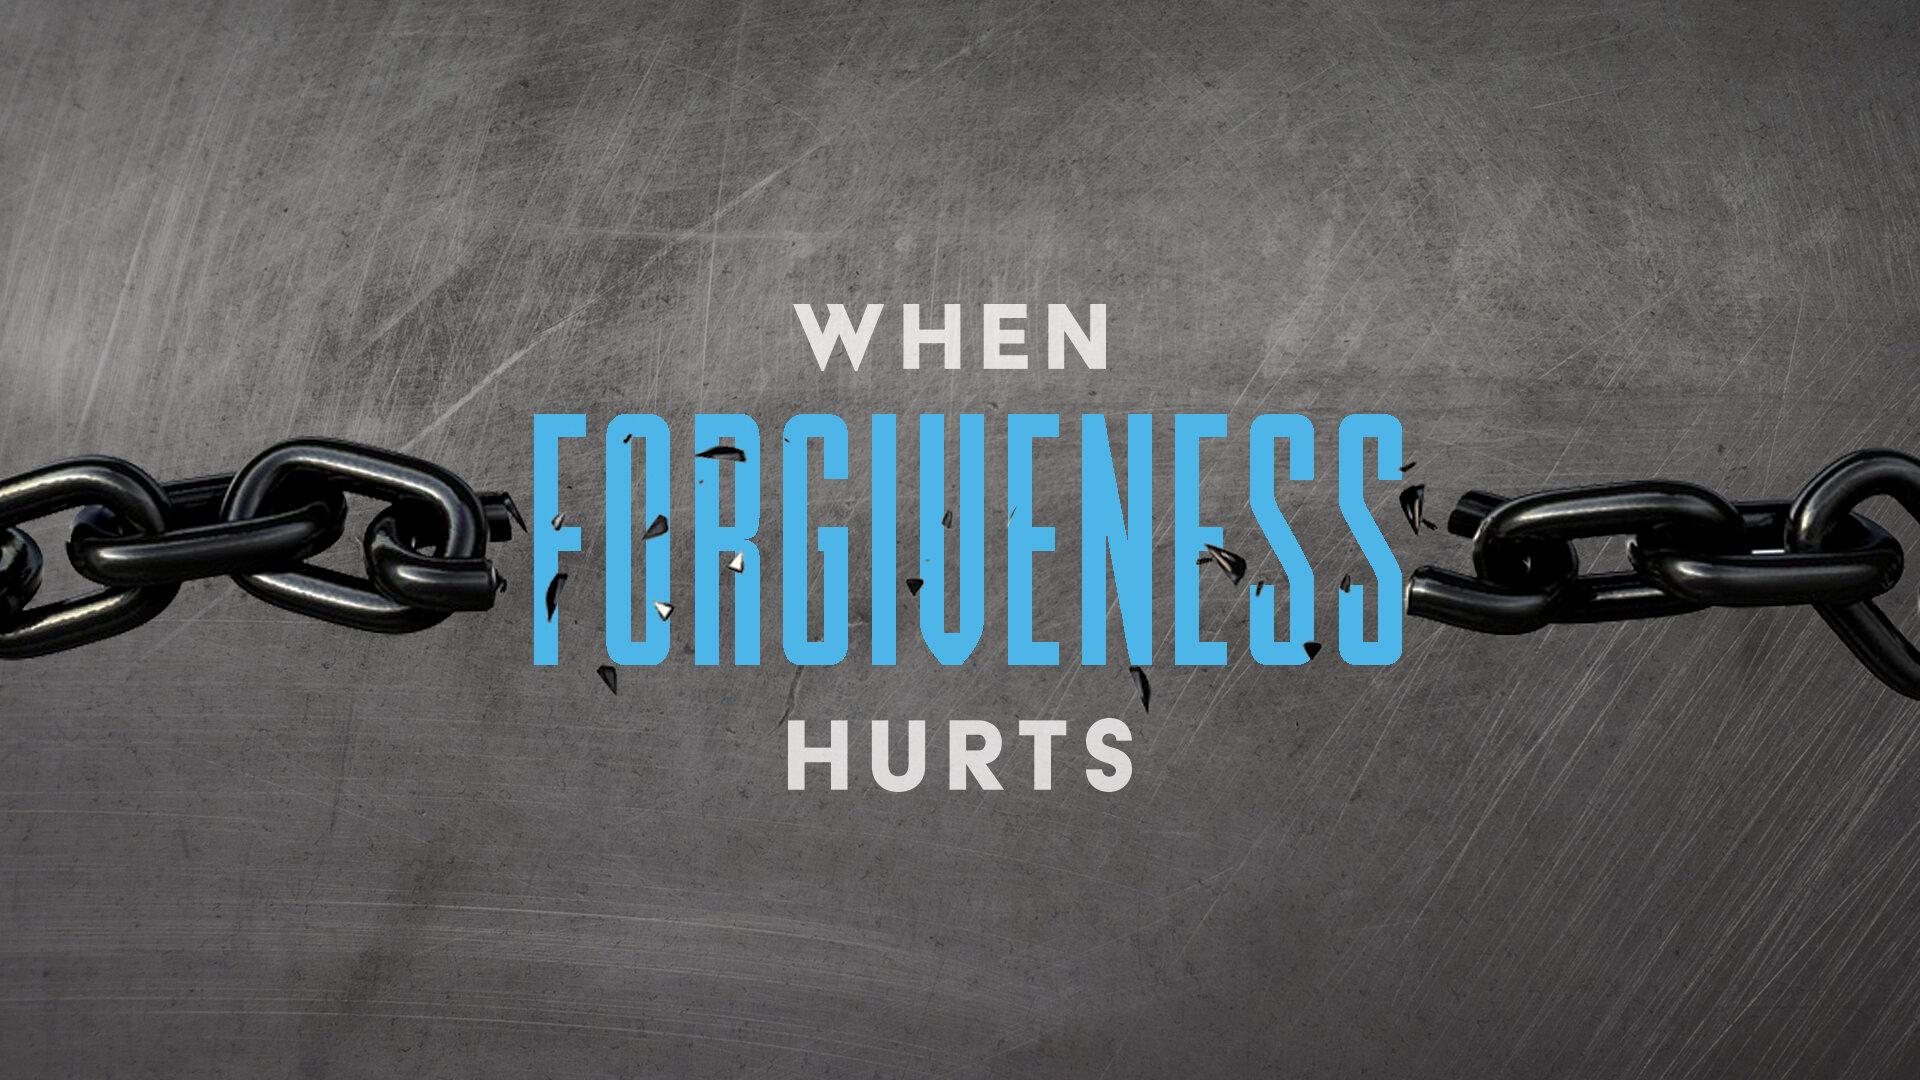 ForgivenessHurtsFinal.jpg